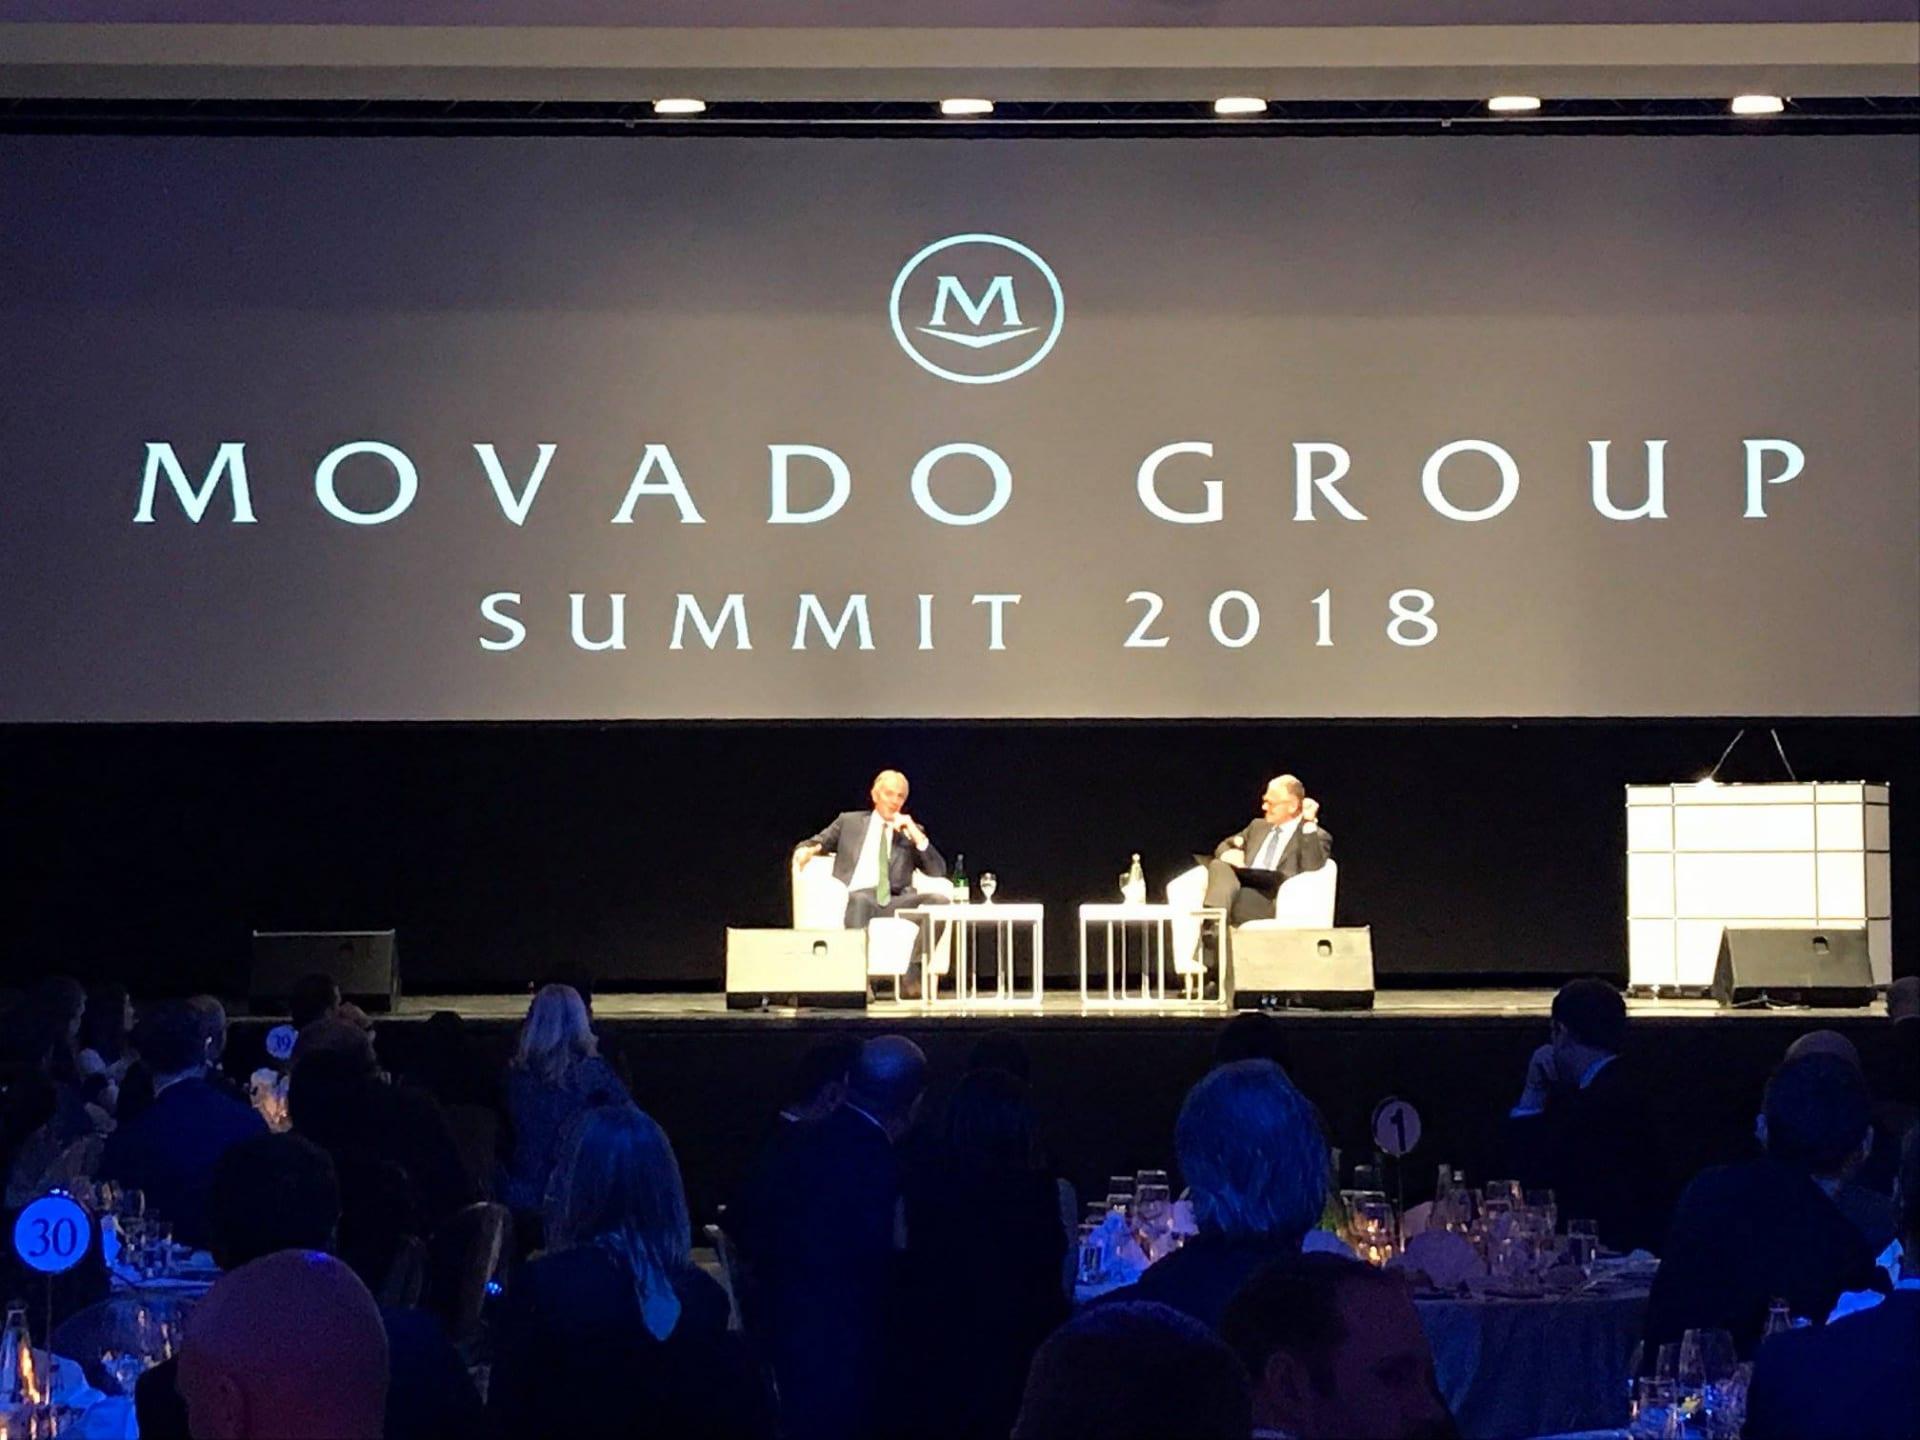 Movado Group Summit